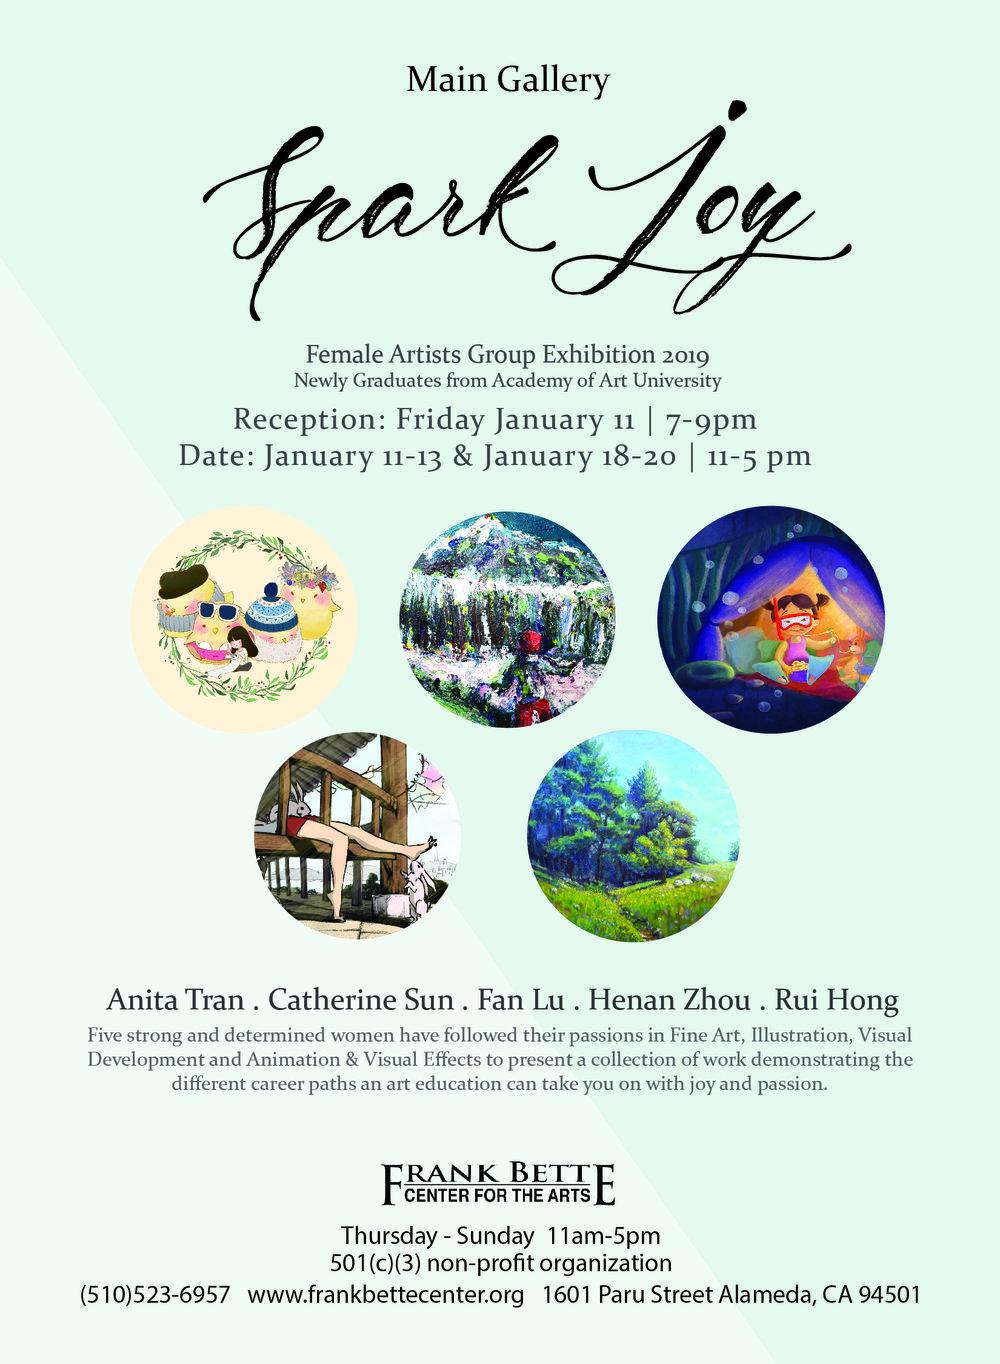 postcard- spark joy-5 female artists group exhibition 2019-frank bette.jpg